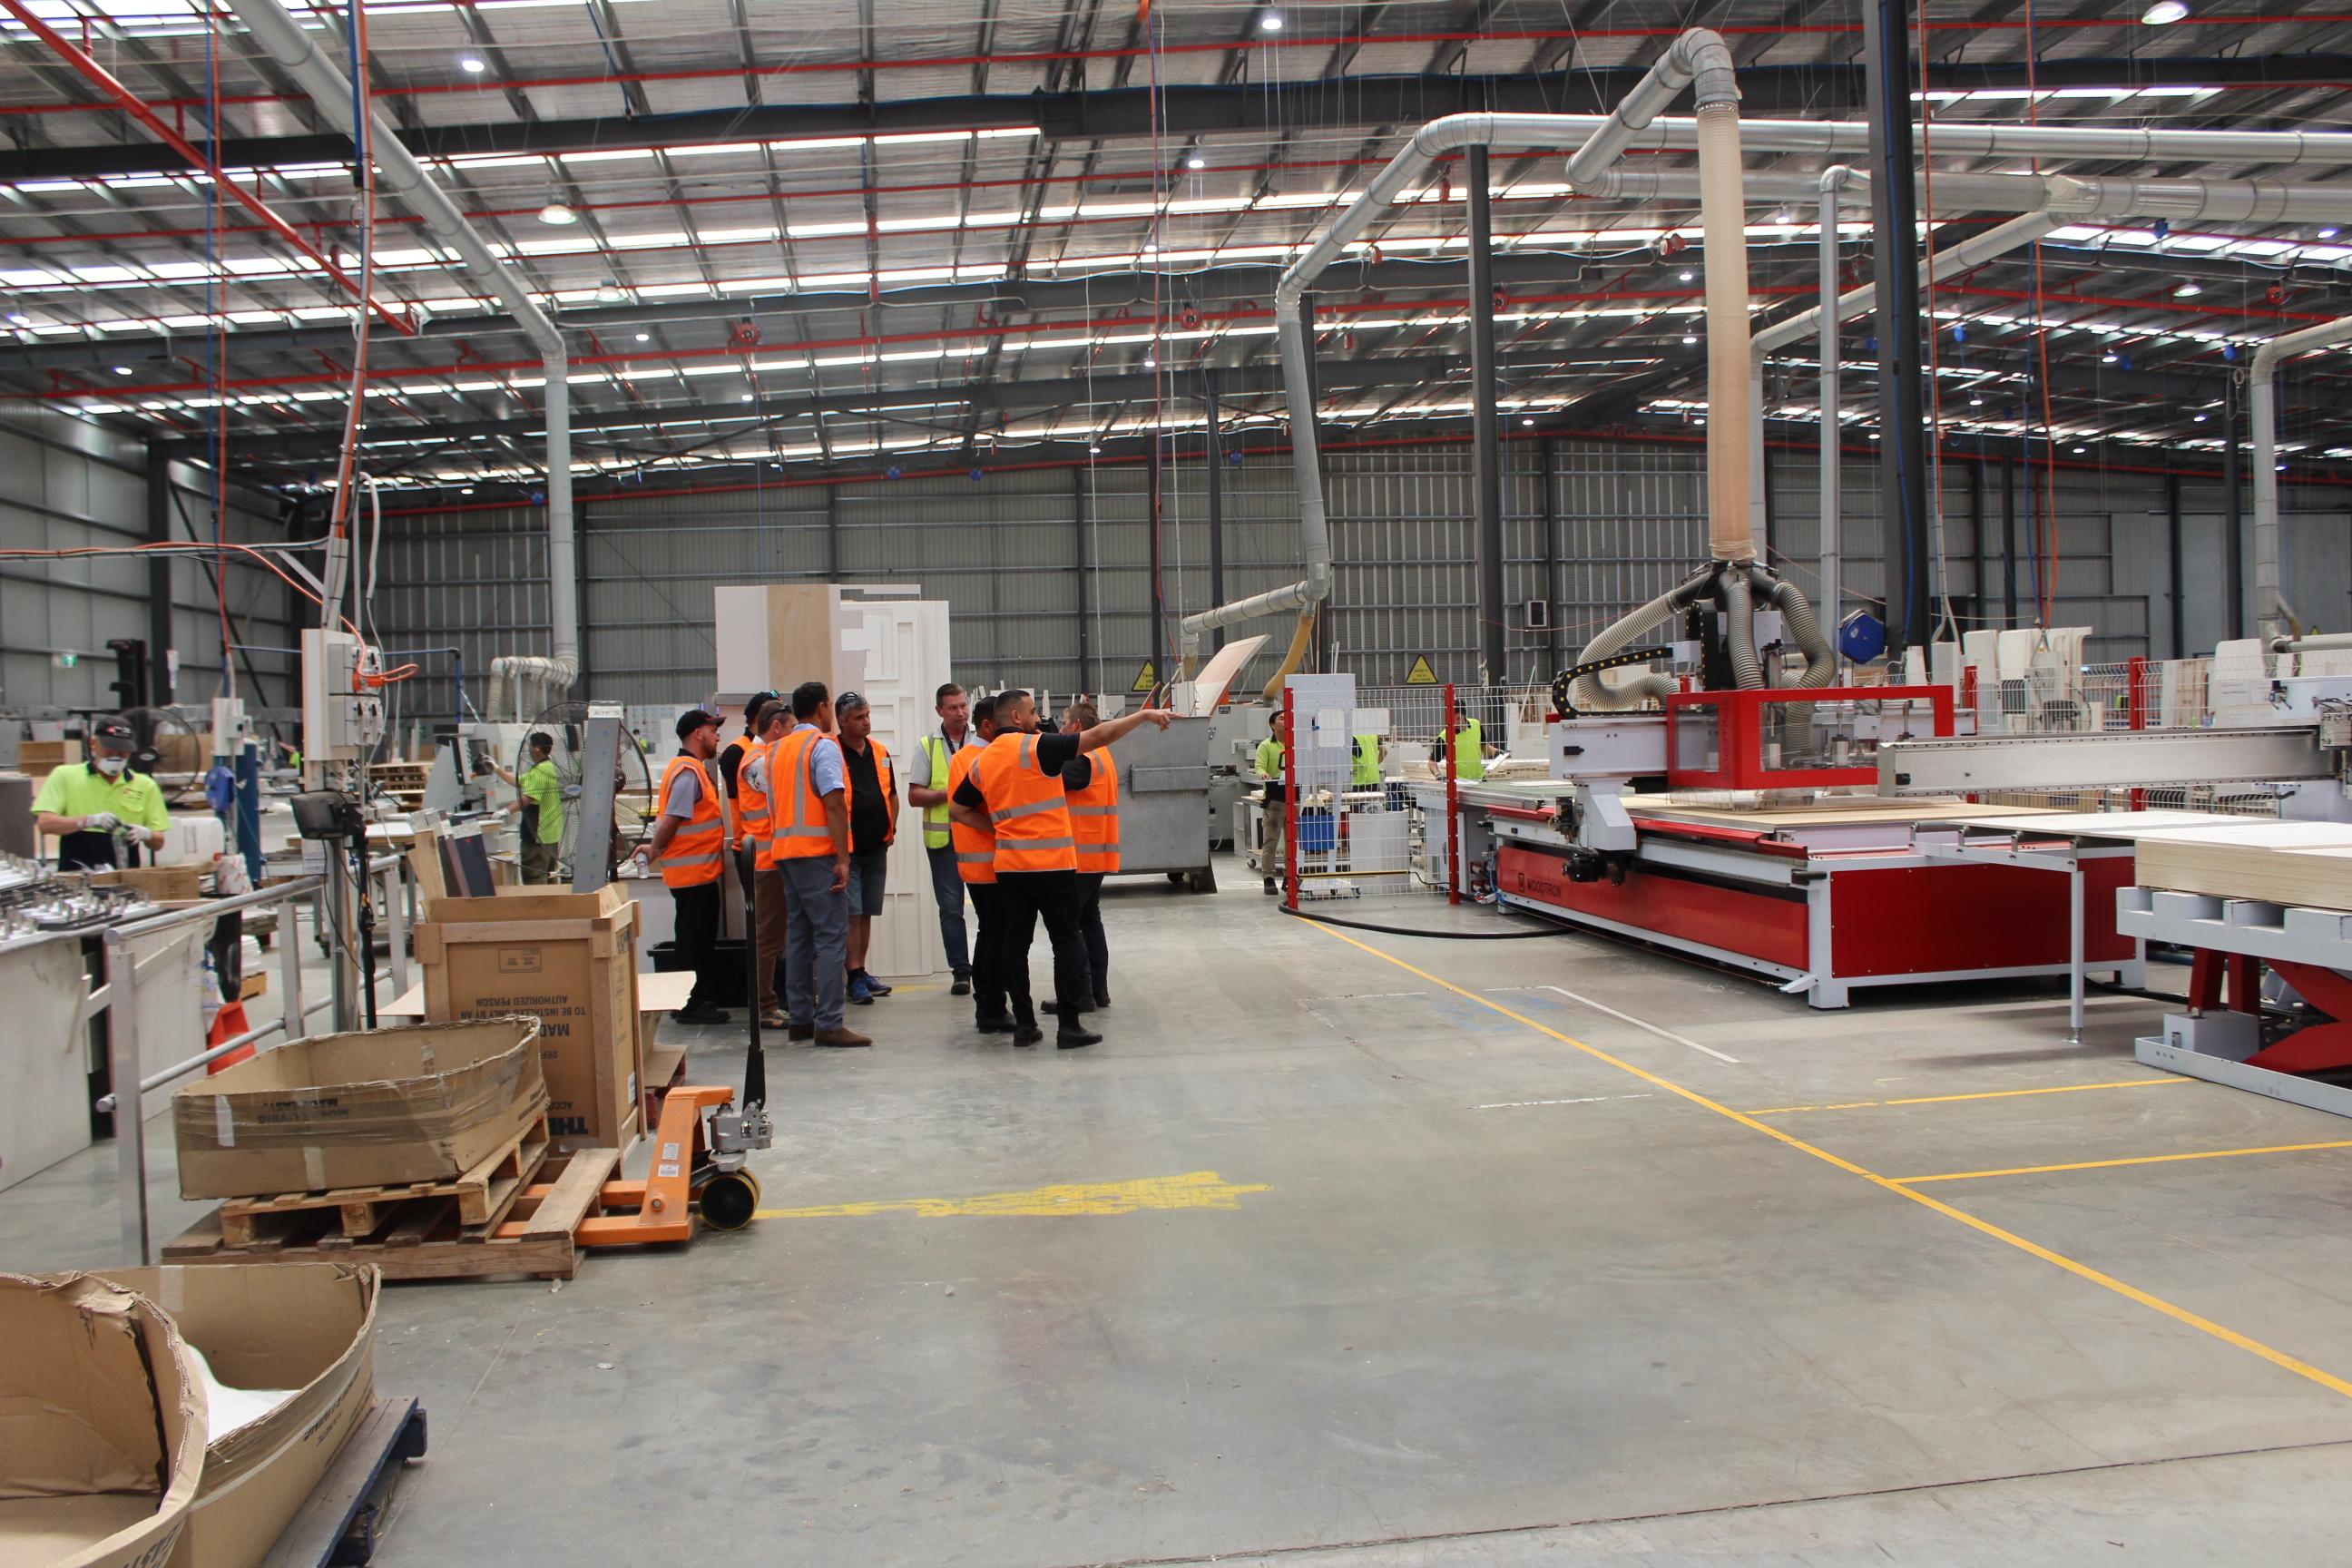 New Age Caravans Australia staff